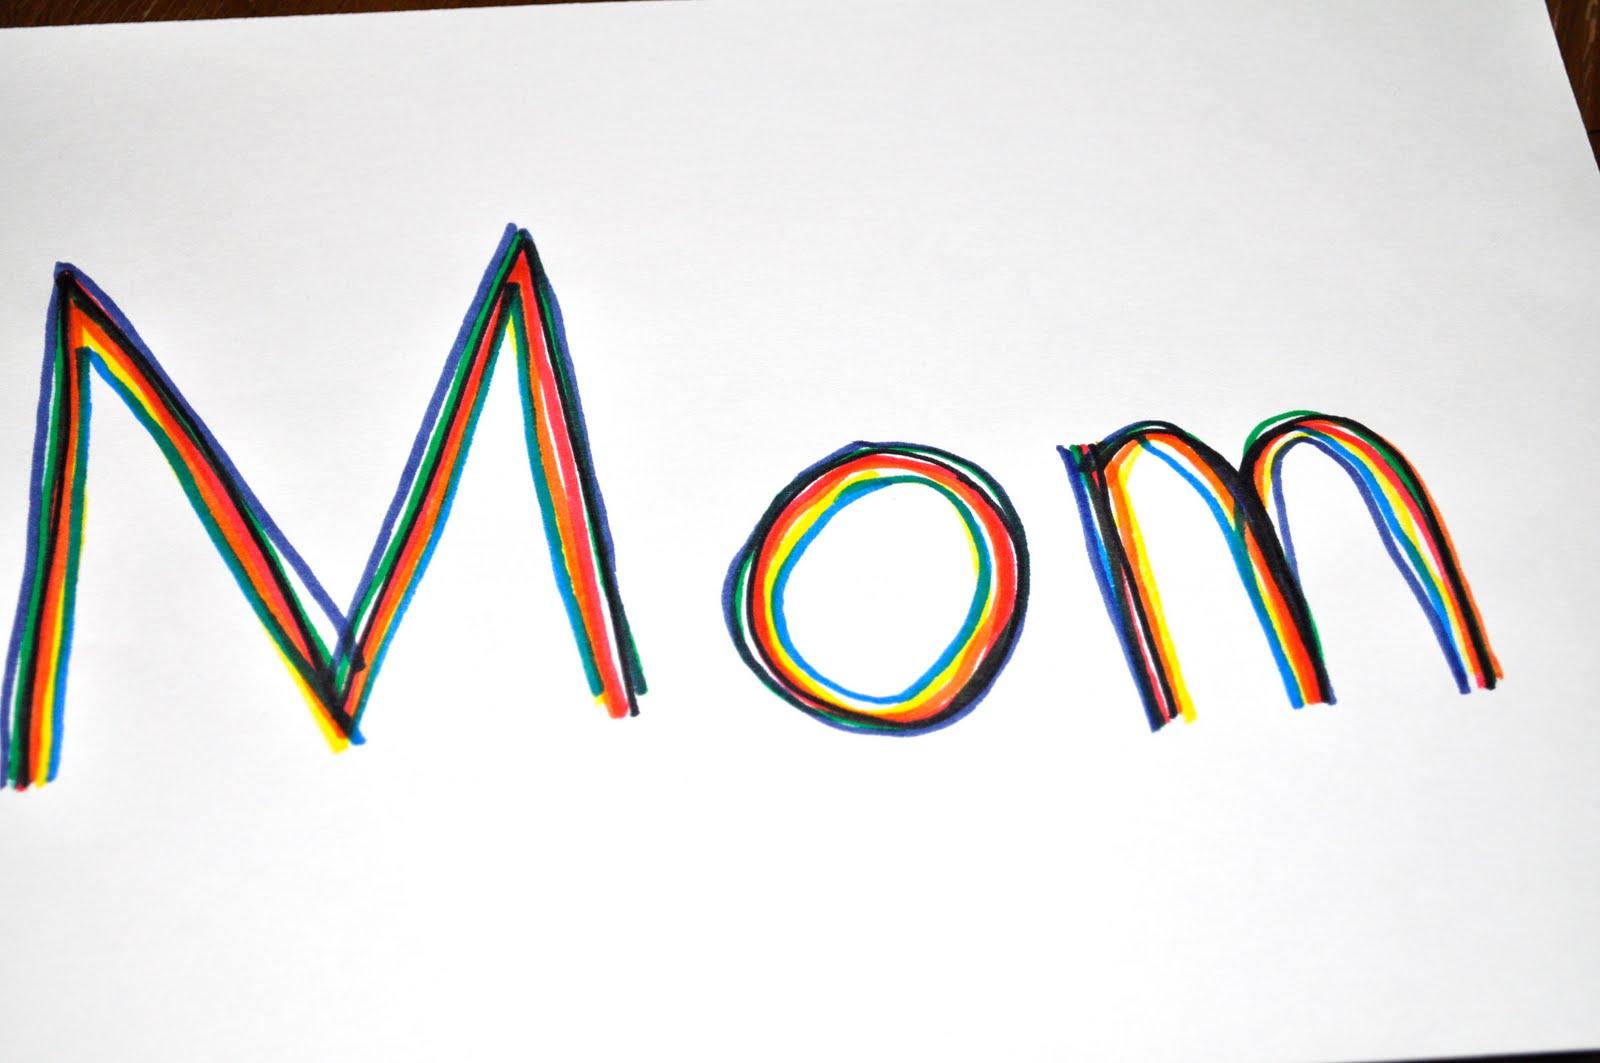 Rainbow Name Trace